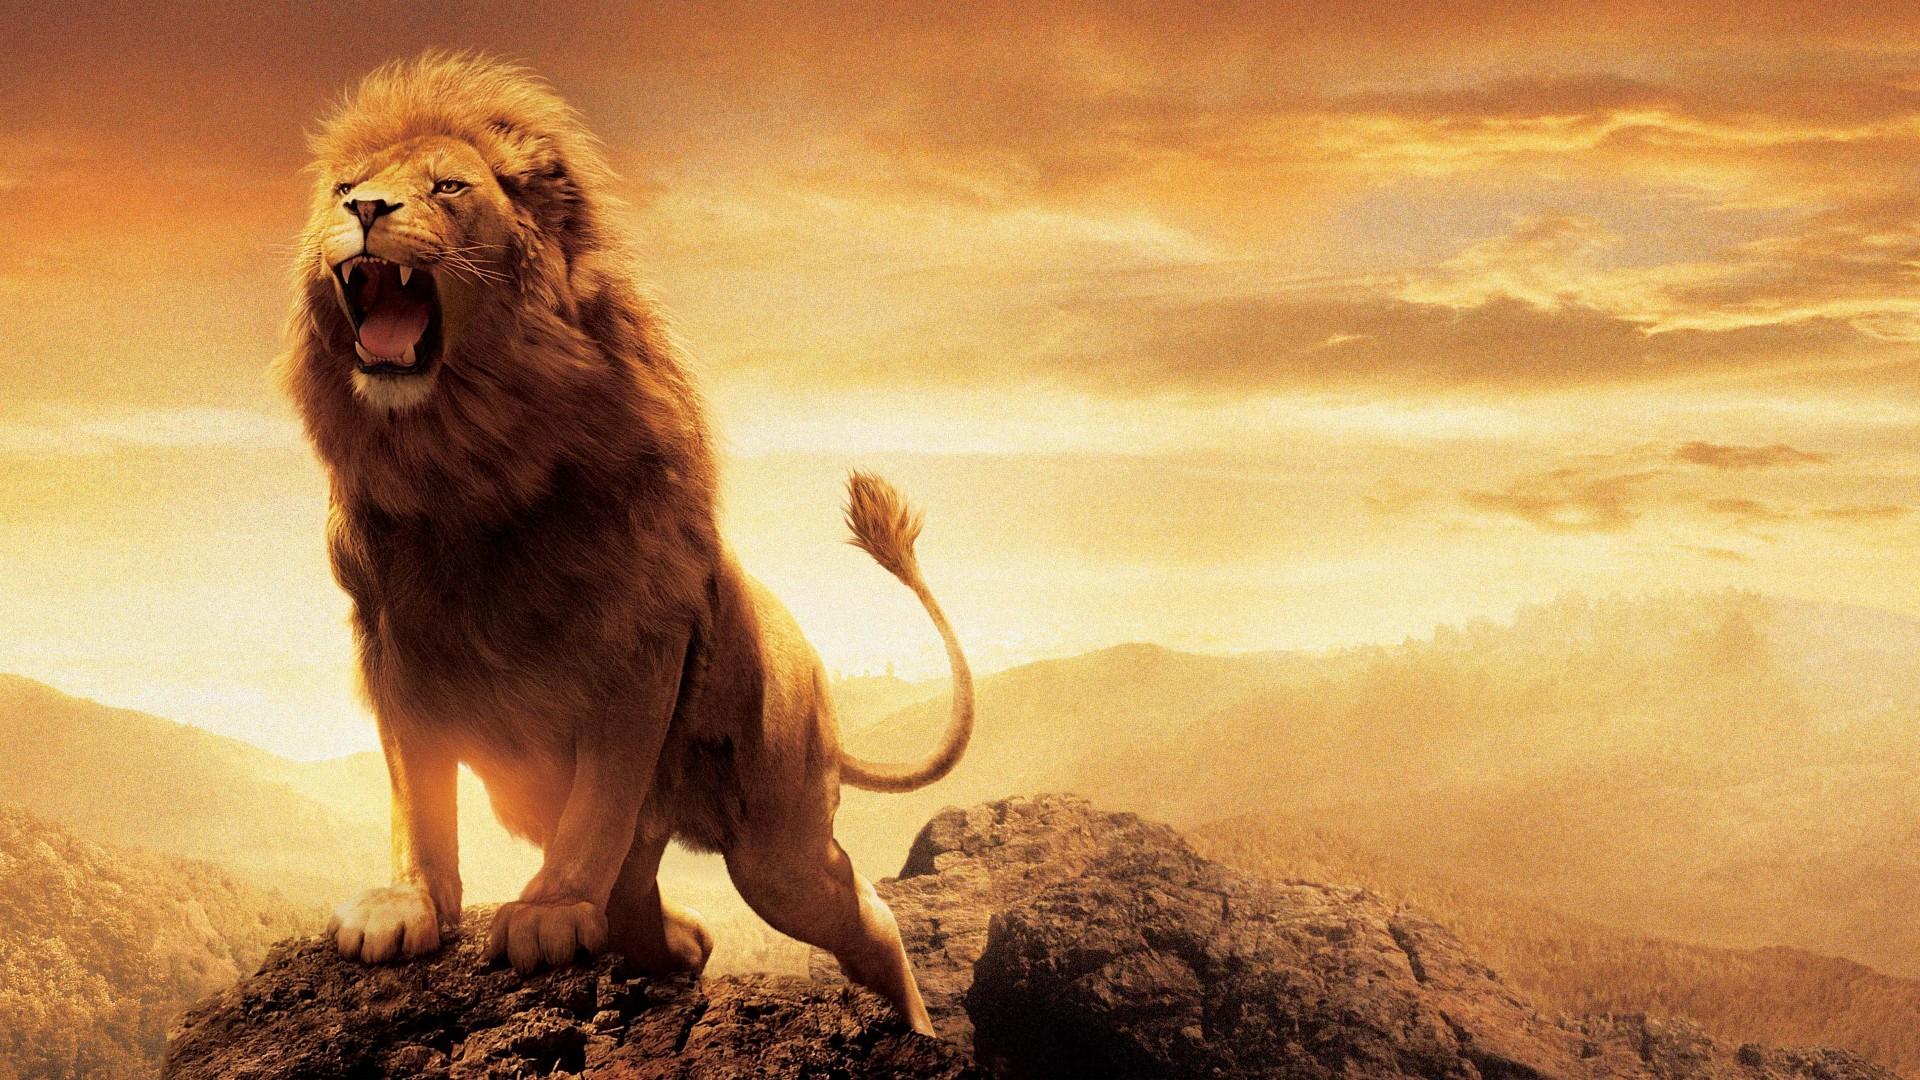 Aslan Narnia Lion Hd Wallpaper For Desktop And Mobiles Iphone 7 Plus